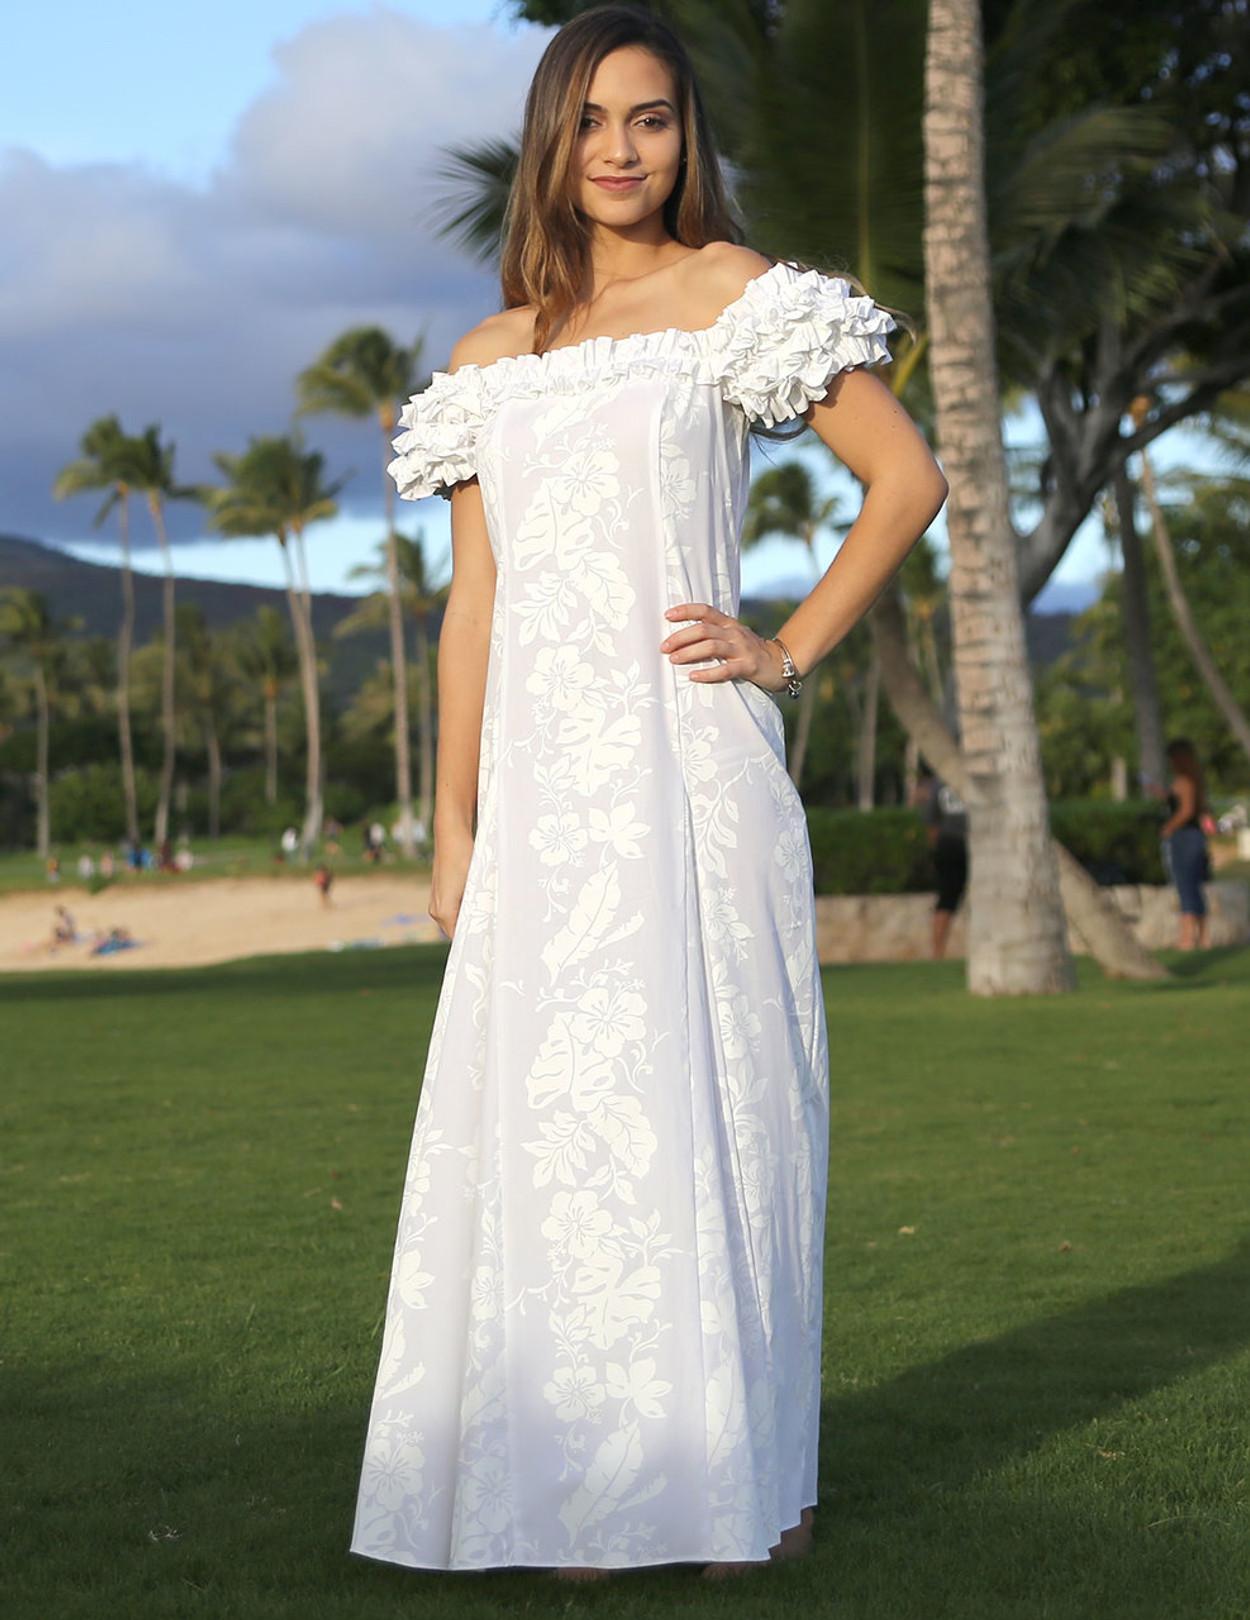 beach wedding dresses 2009C HP white  42433.1523409171 - hawaiian wedding dresses beach